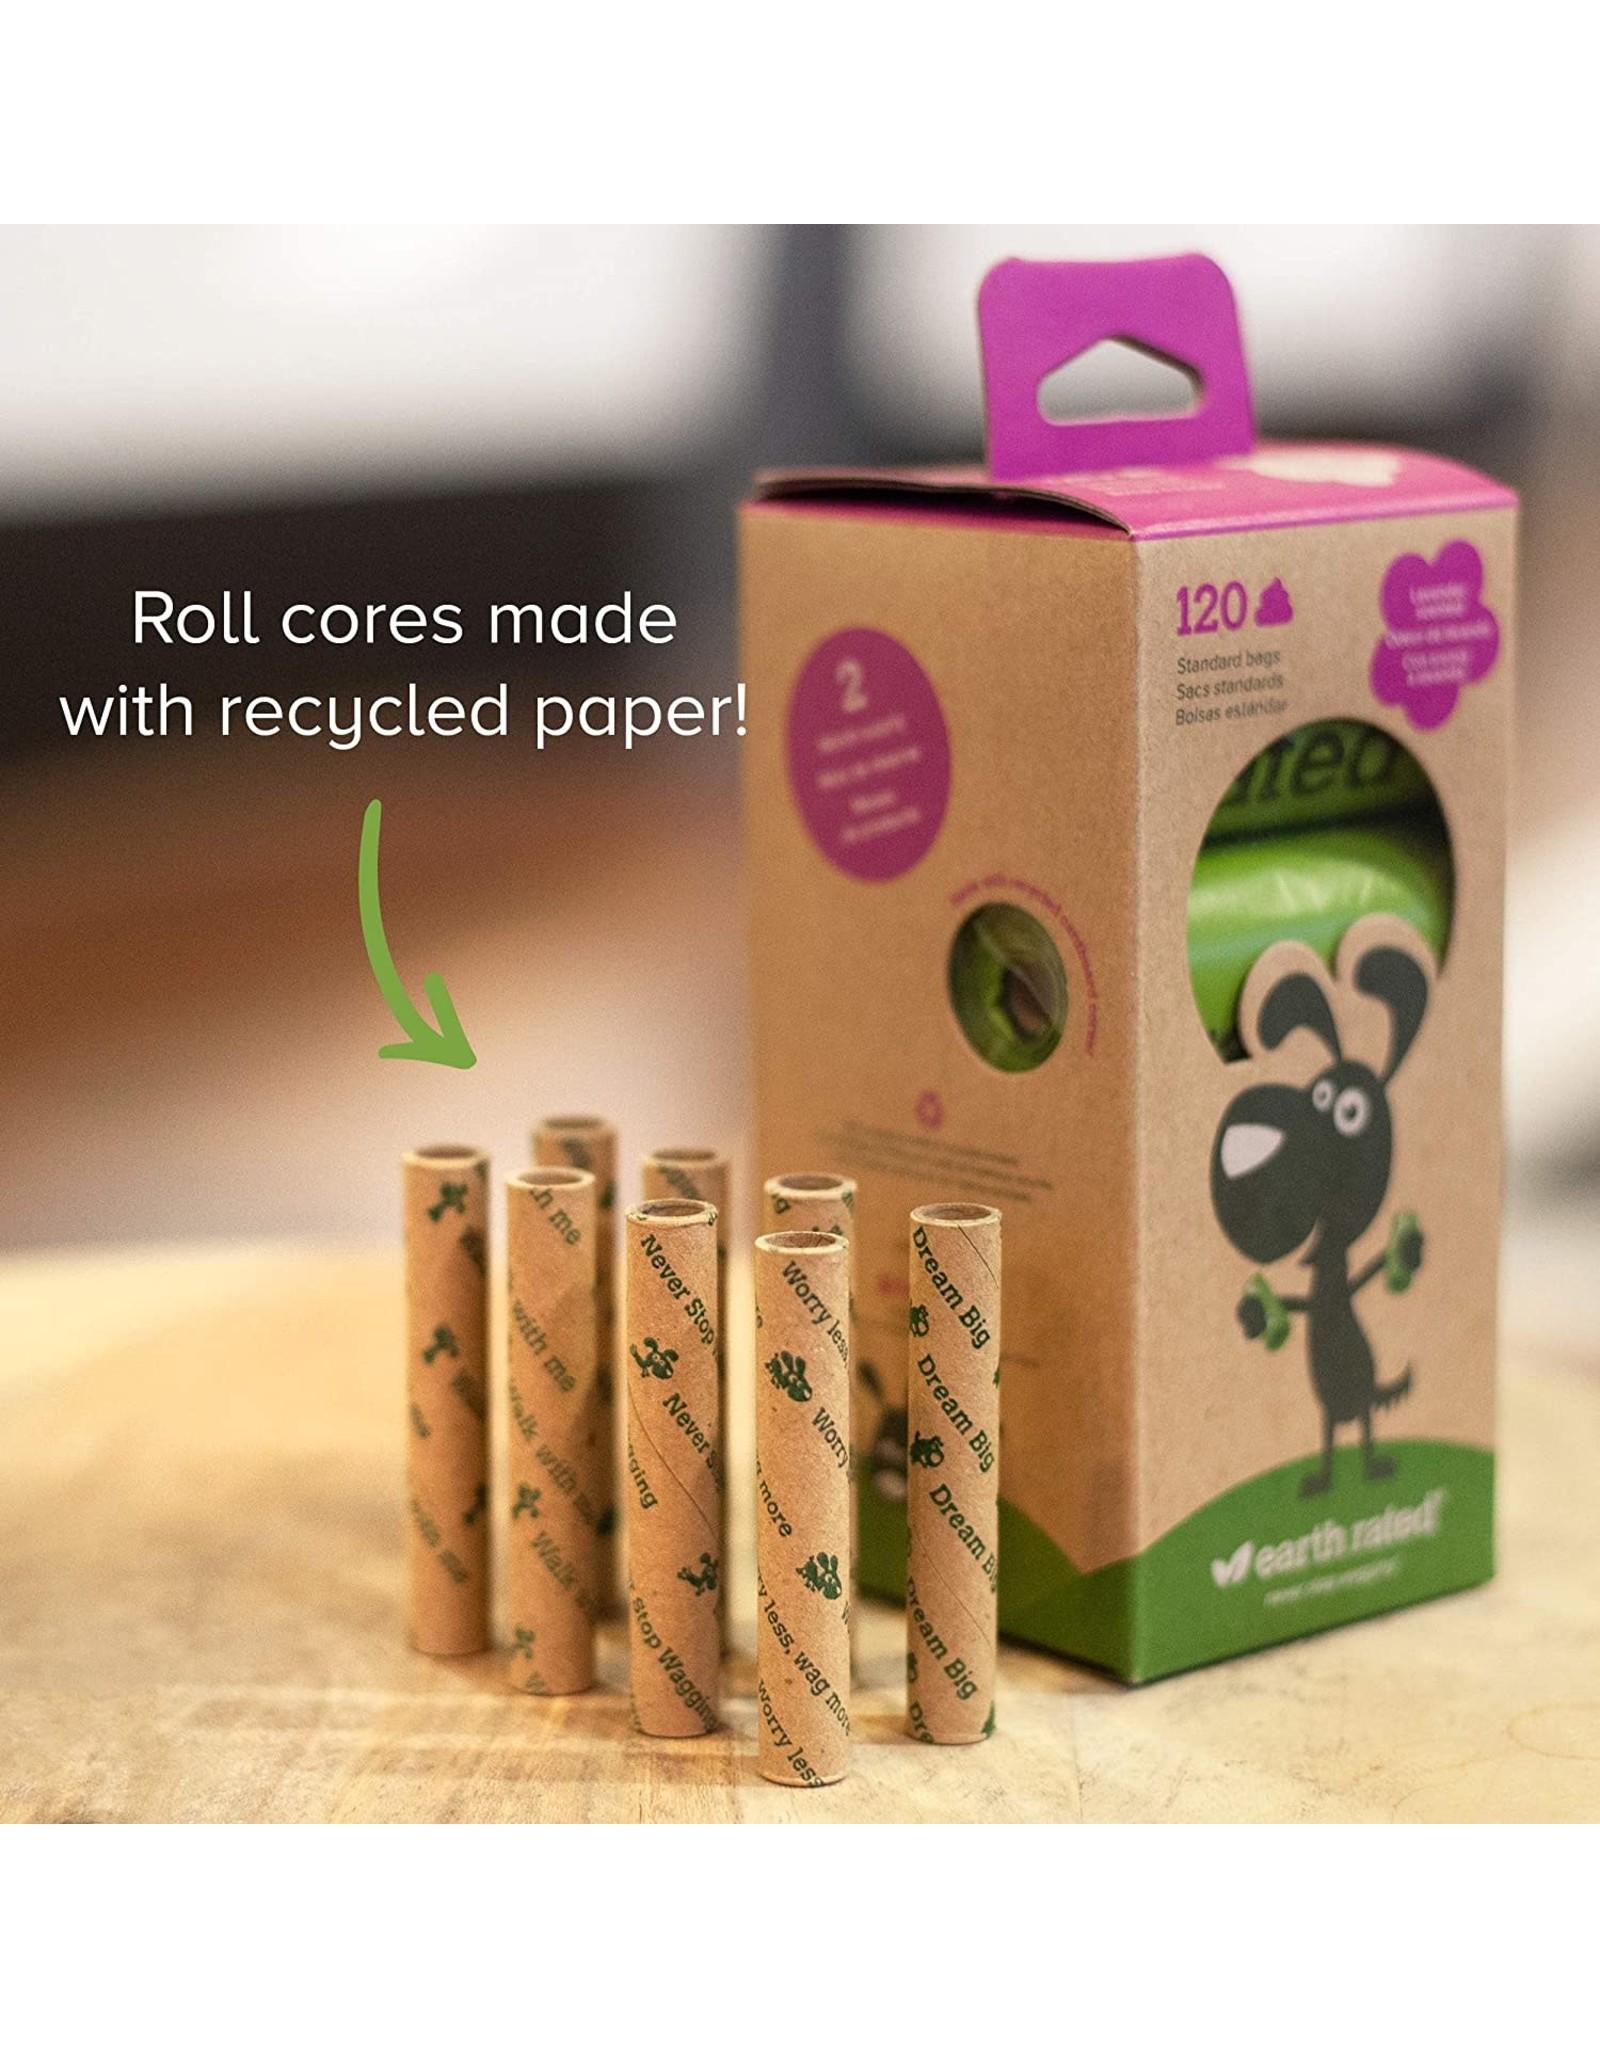 Earthrate Poop Bags Earthrated Poop Bags Lavender Scented Eco-Friendly Bags 120ct